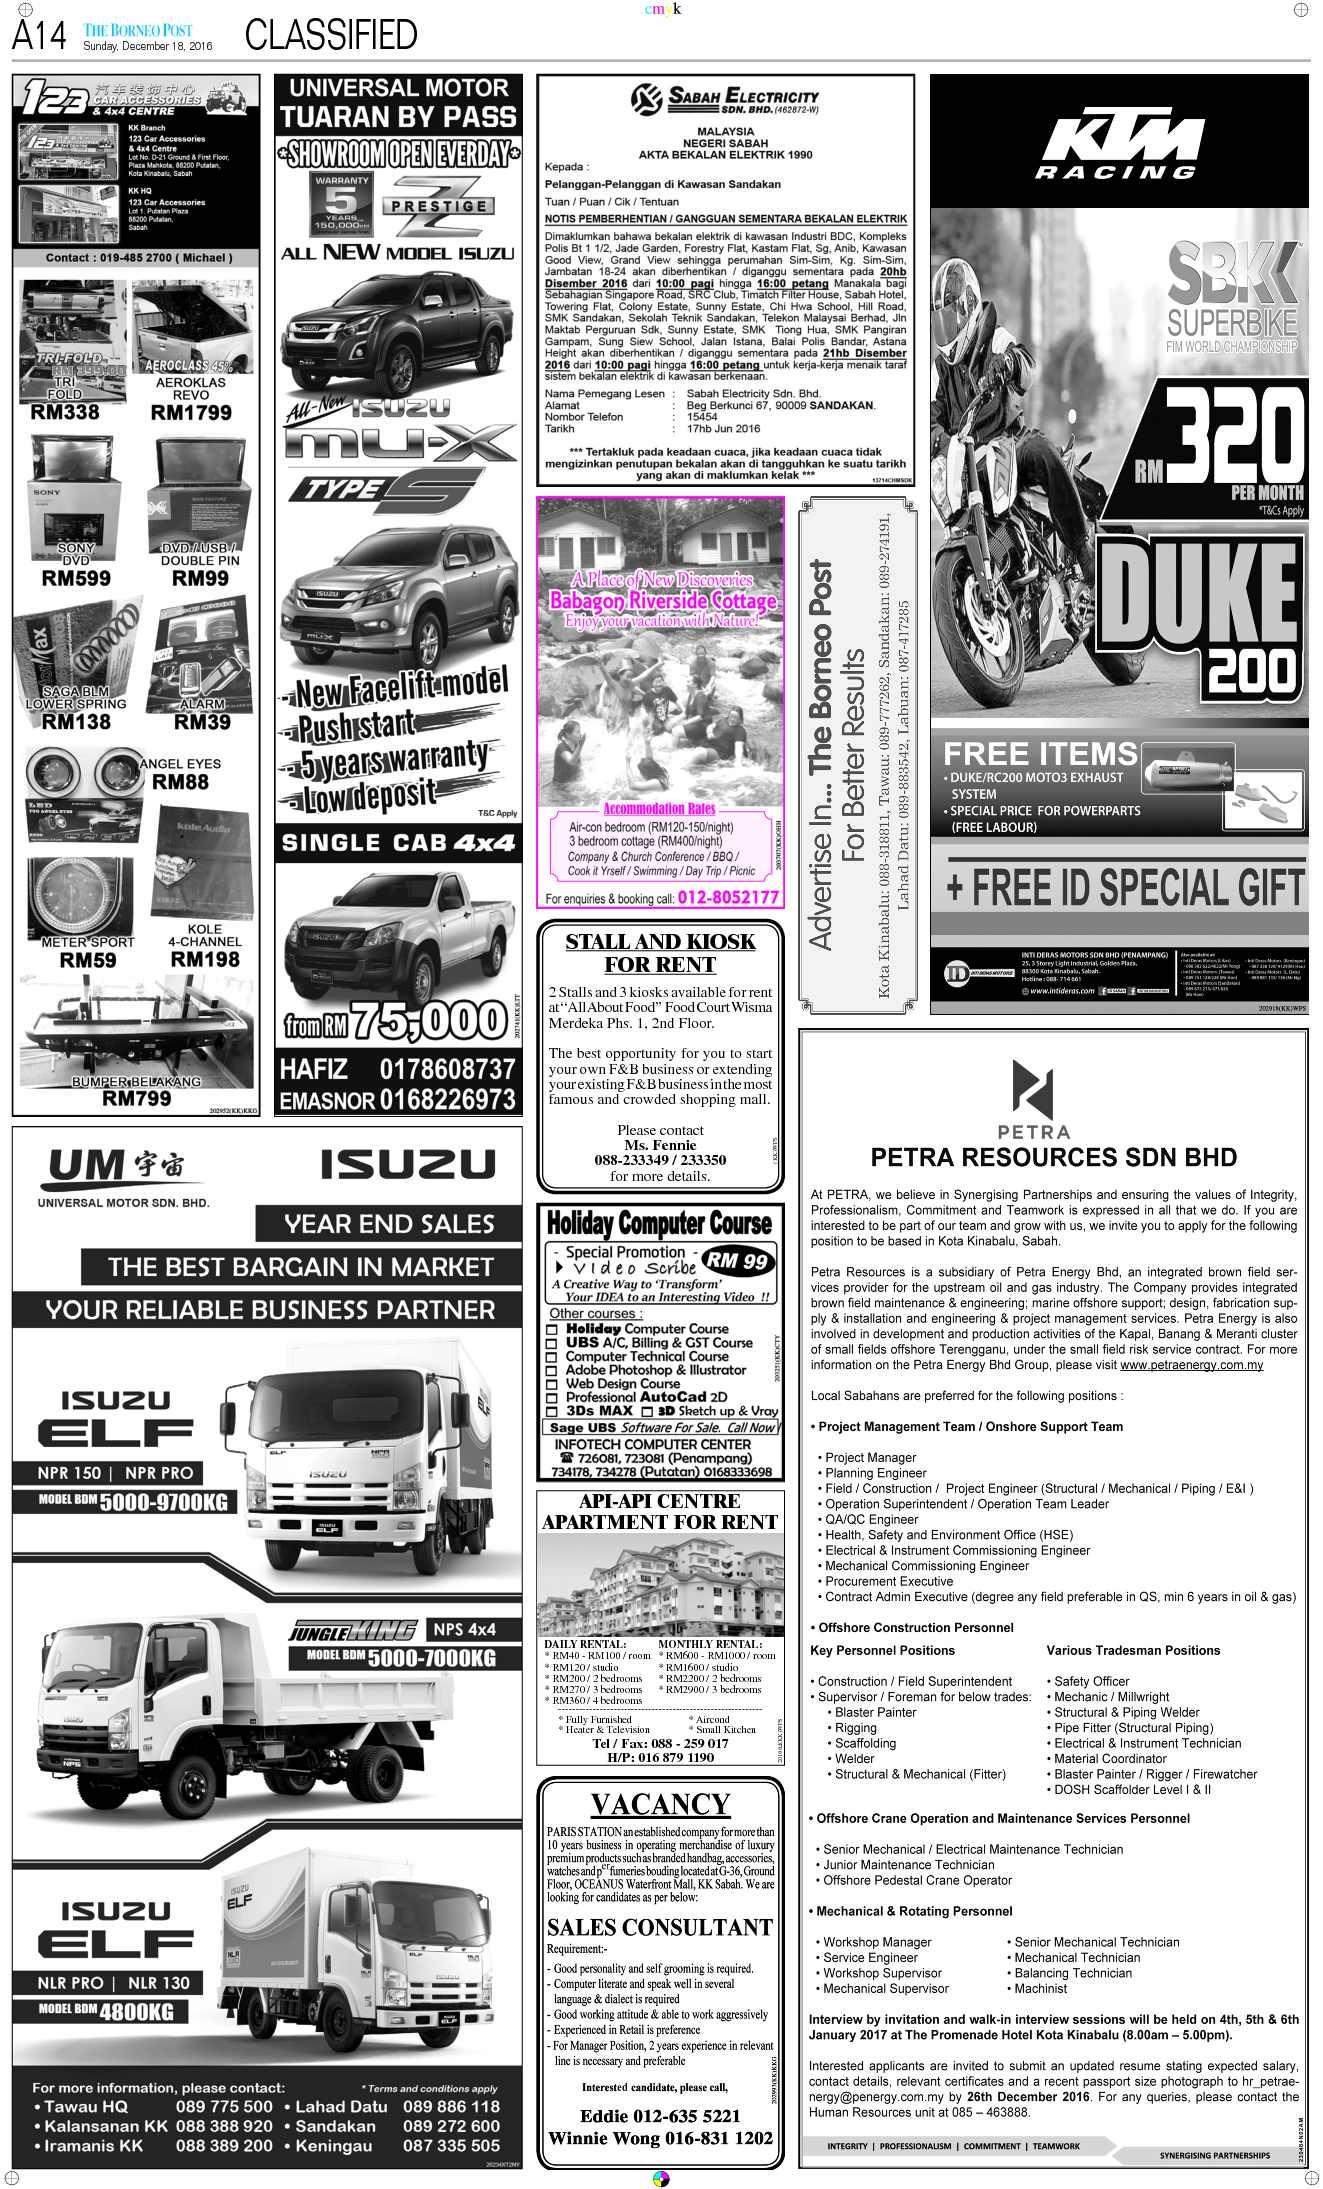 Sunday - Dec 18   The Borneo Post Classifieds